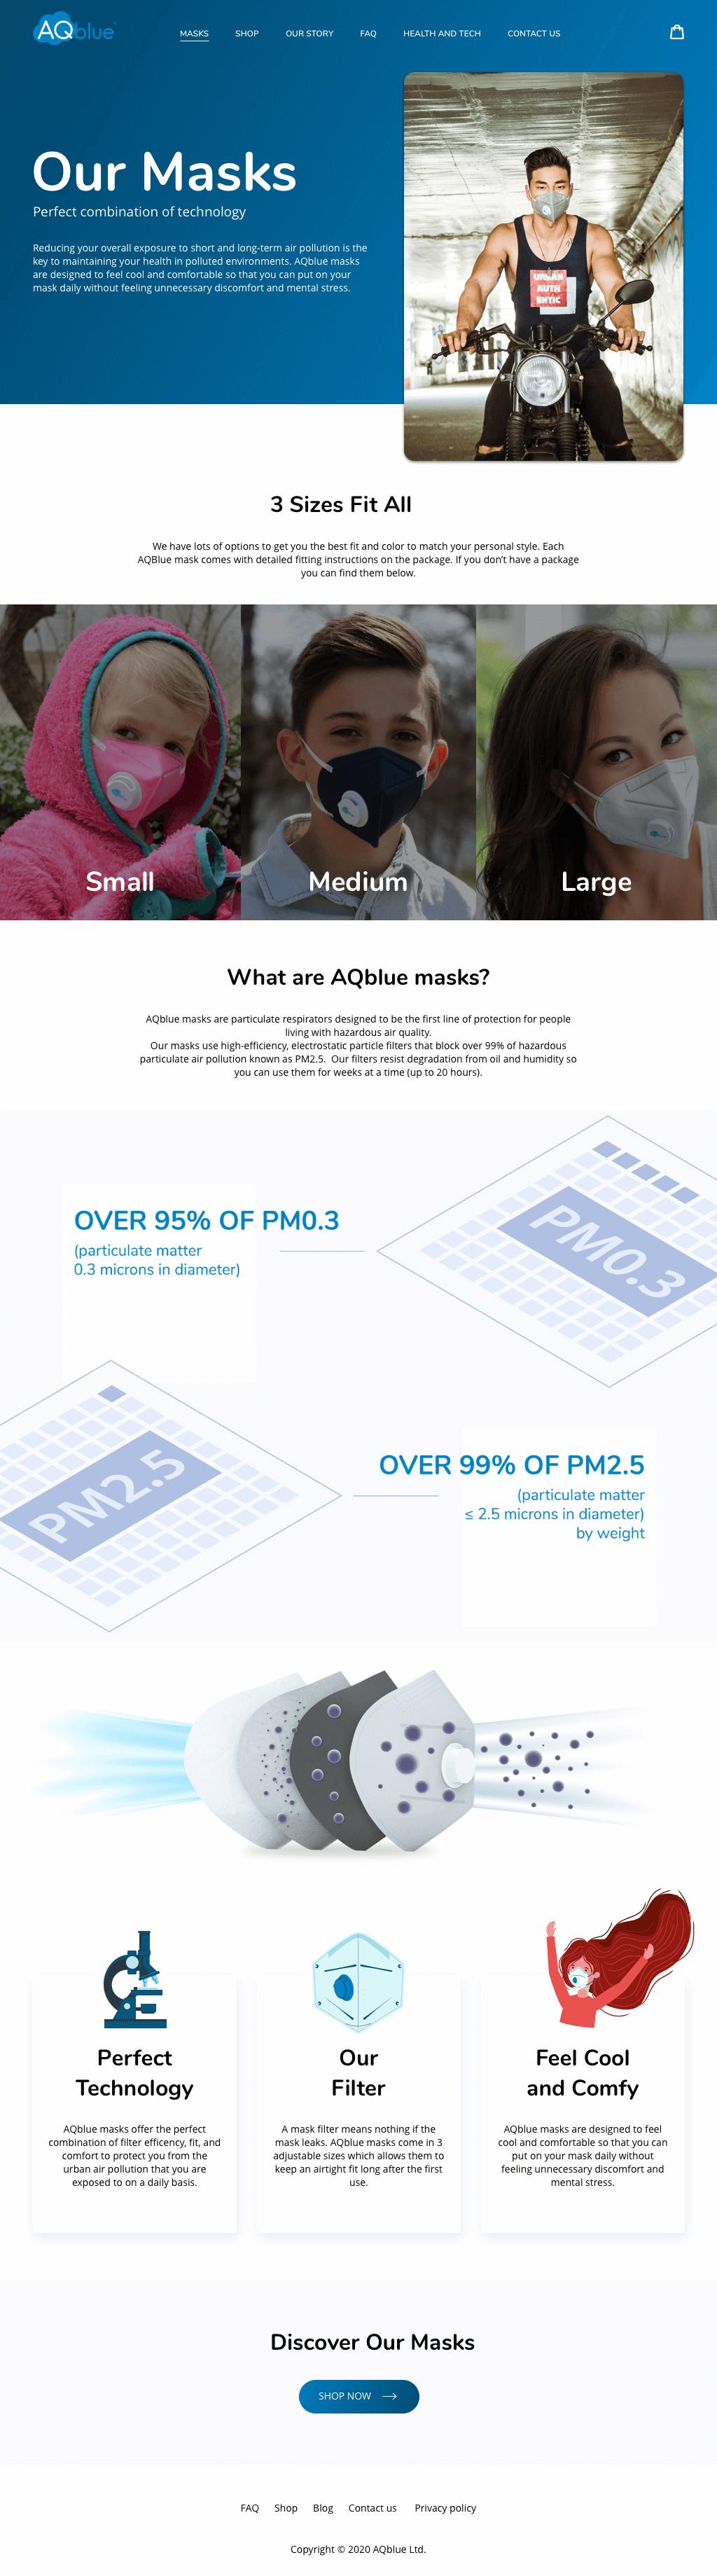 AQBLUE-desktop-masks